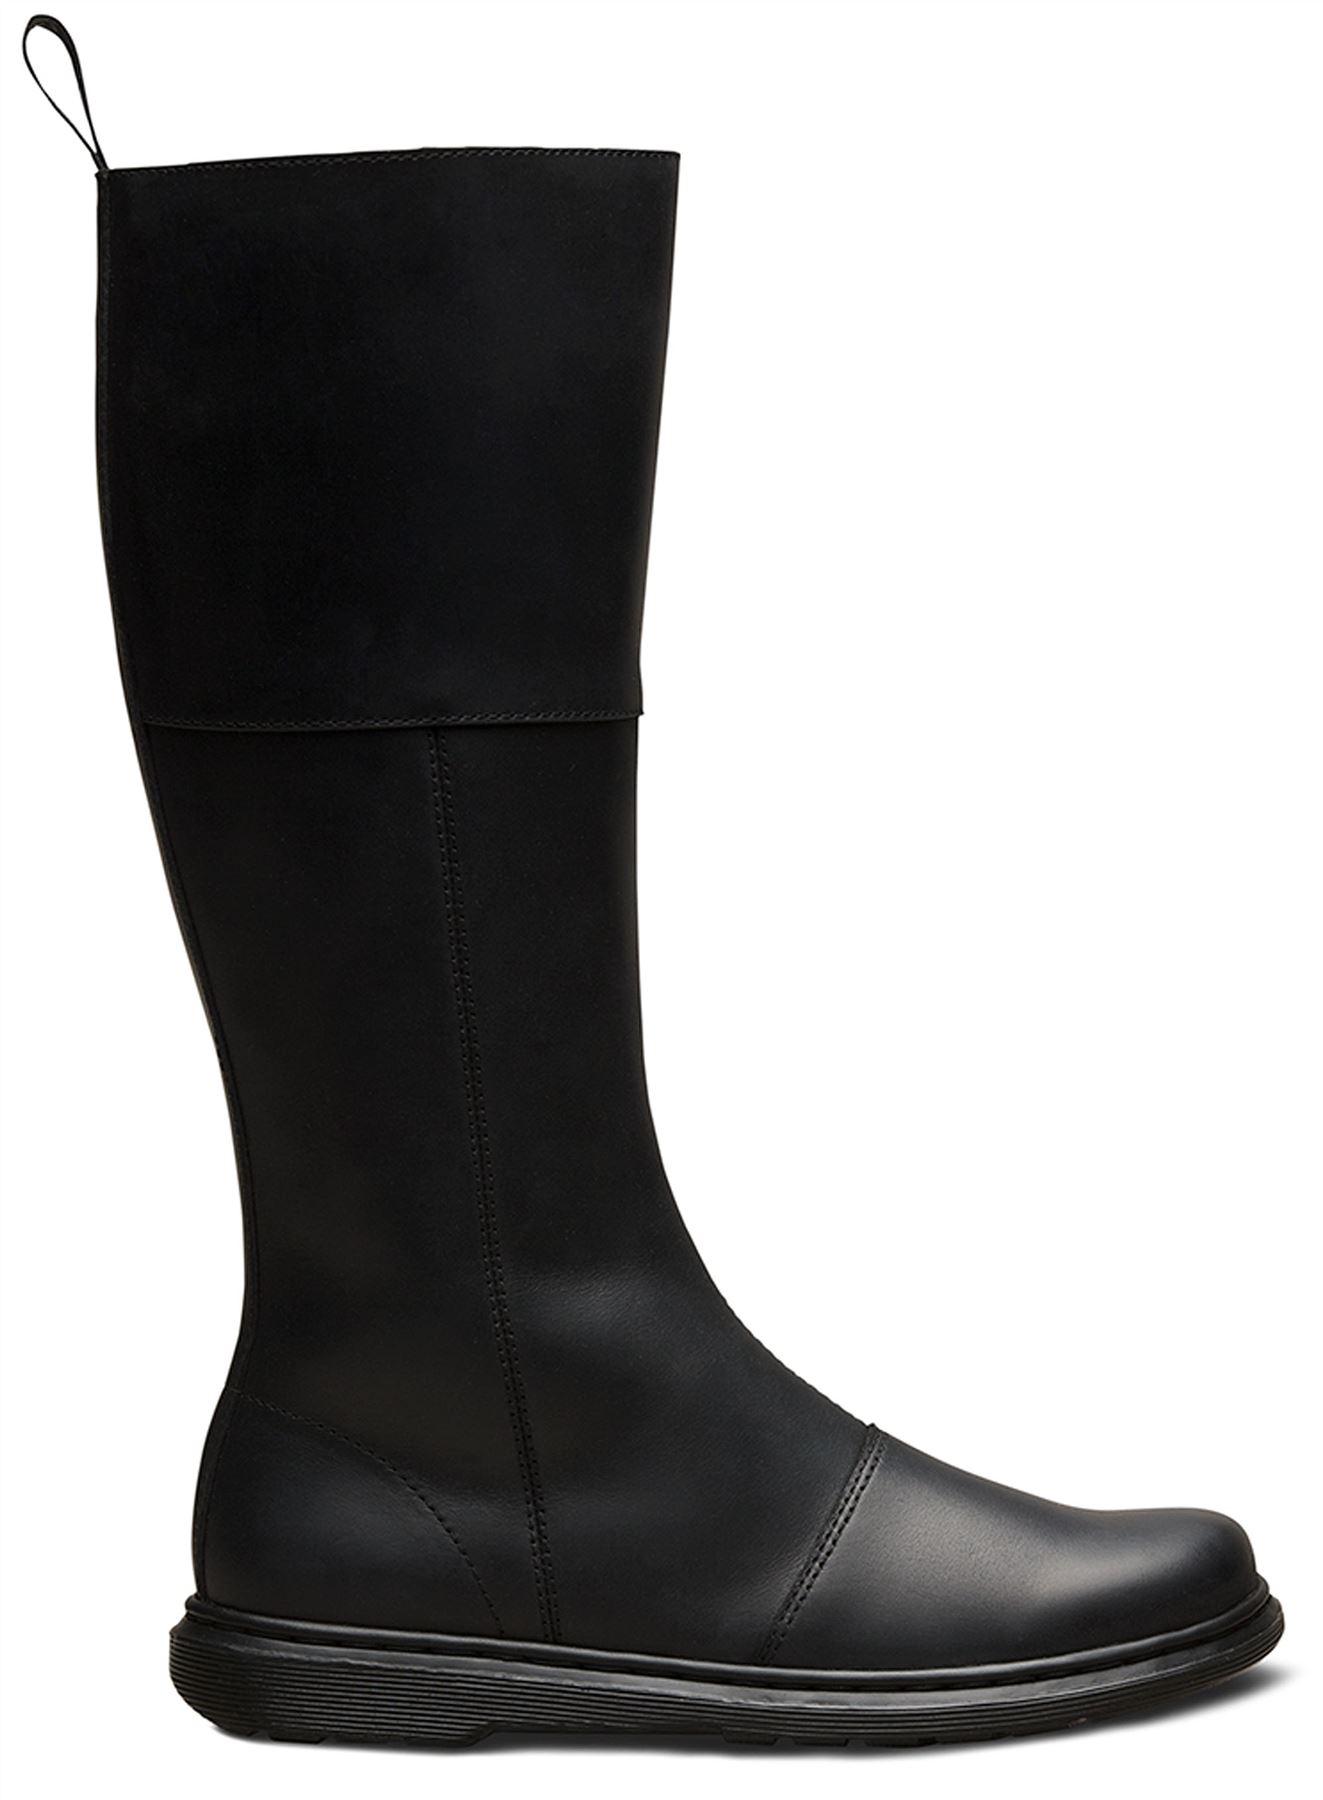 1cf8470f8776 Dr Martens Ladies Lahiri Black Illusion Premium Smooth Leather Tall ...